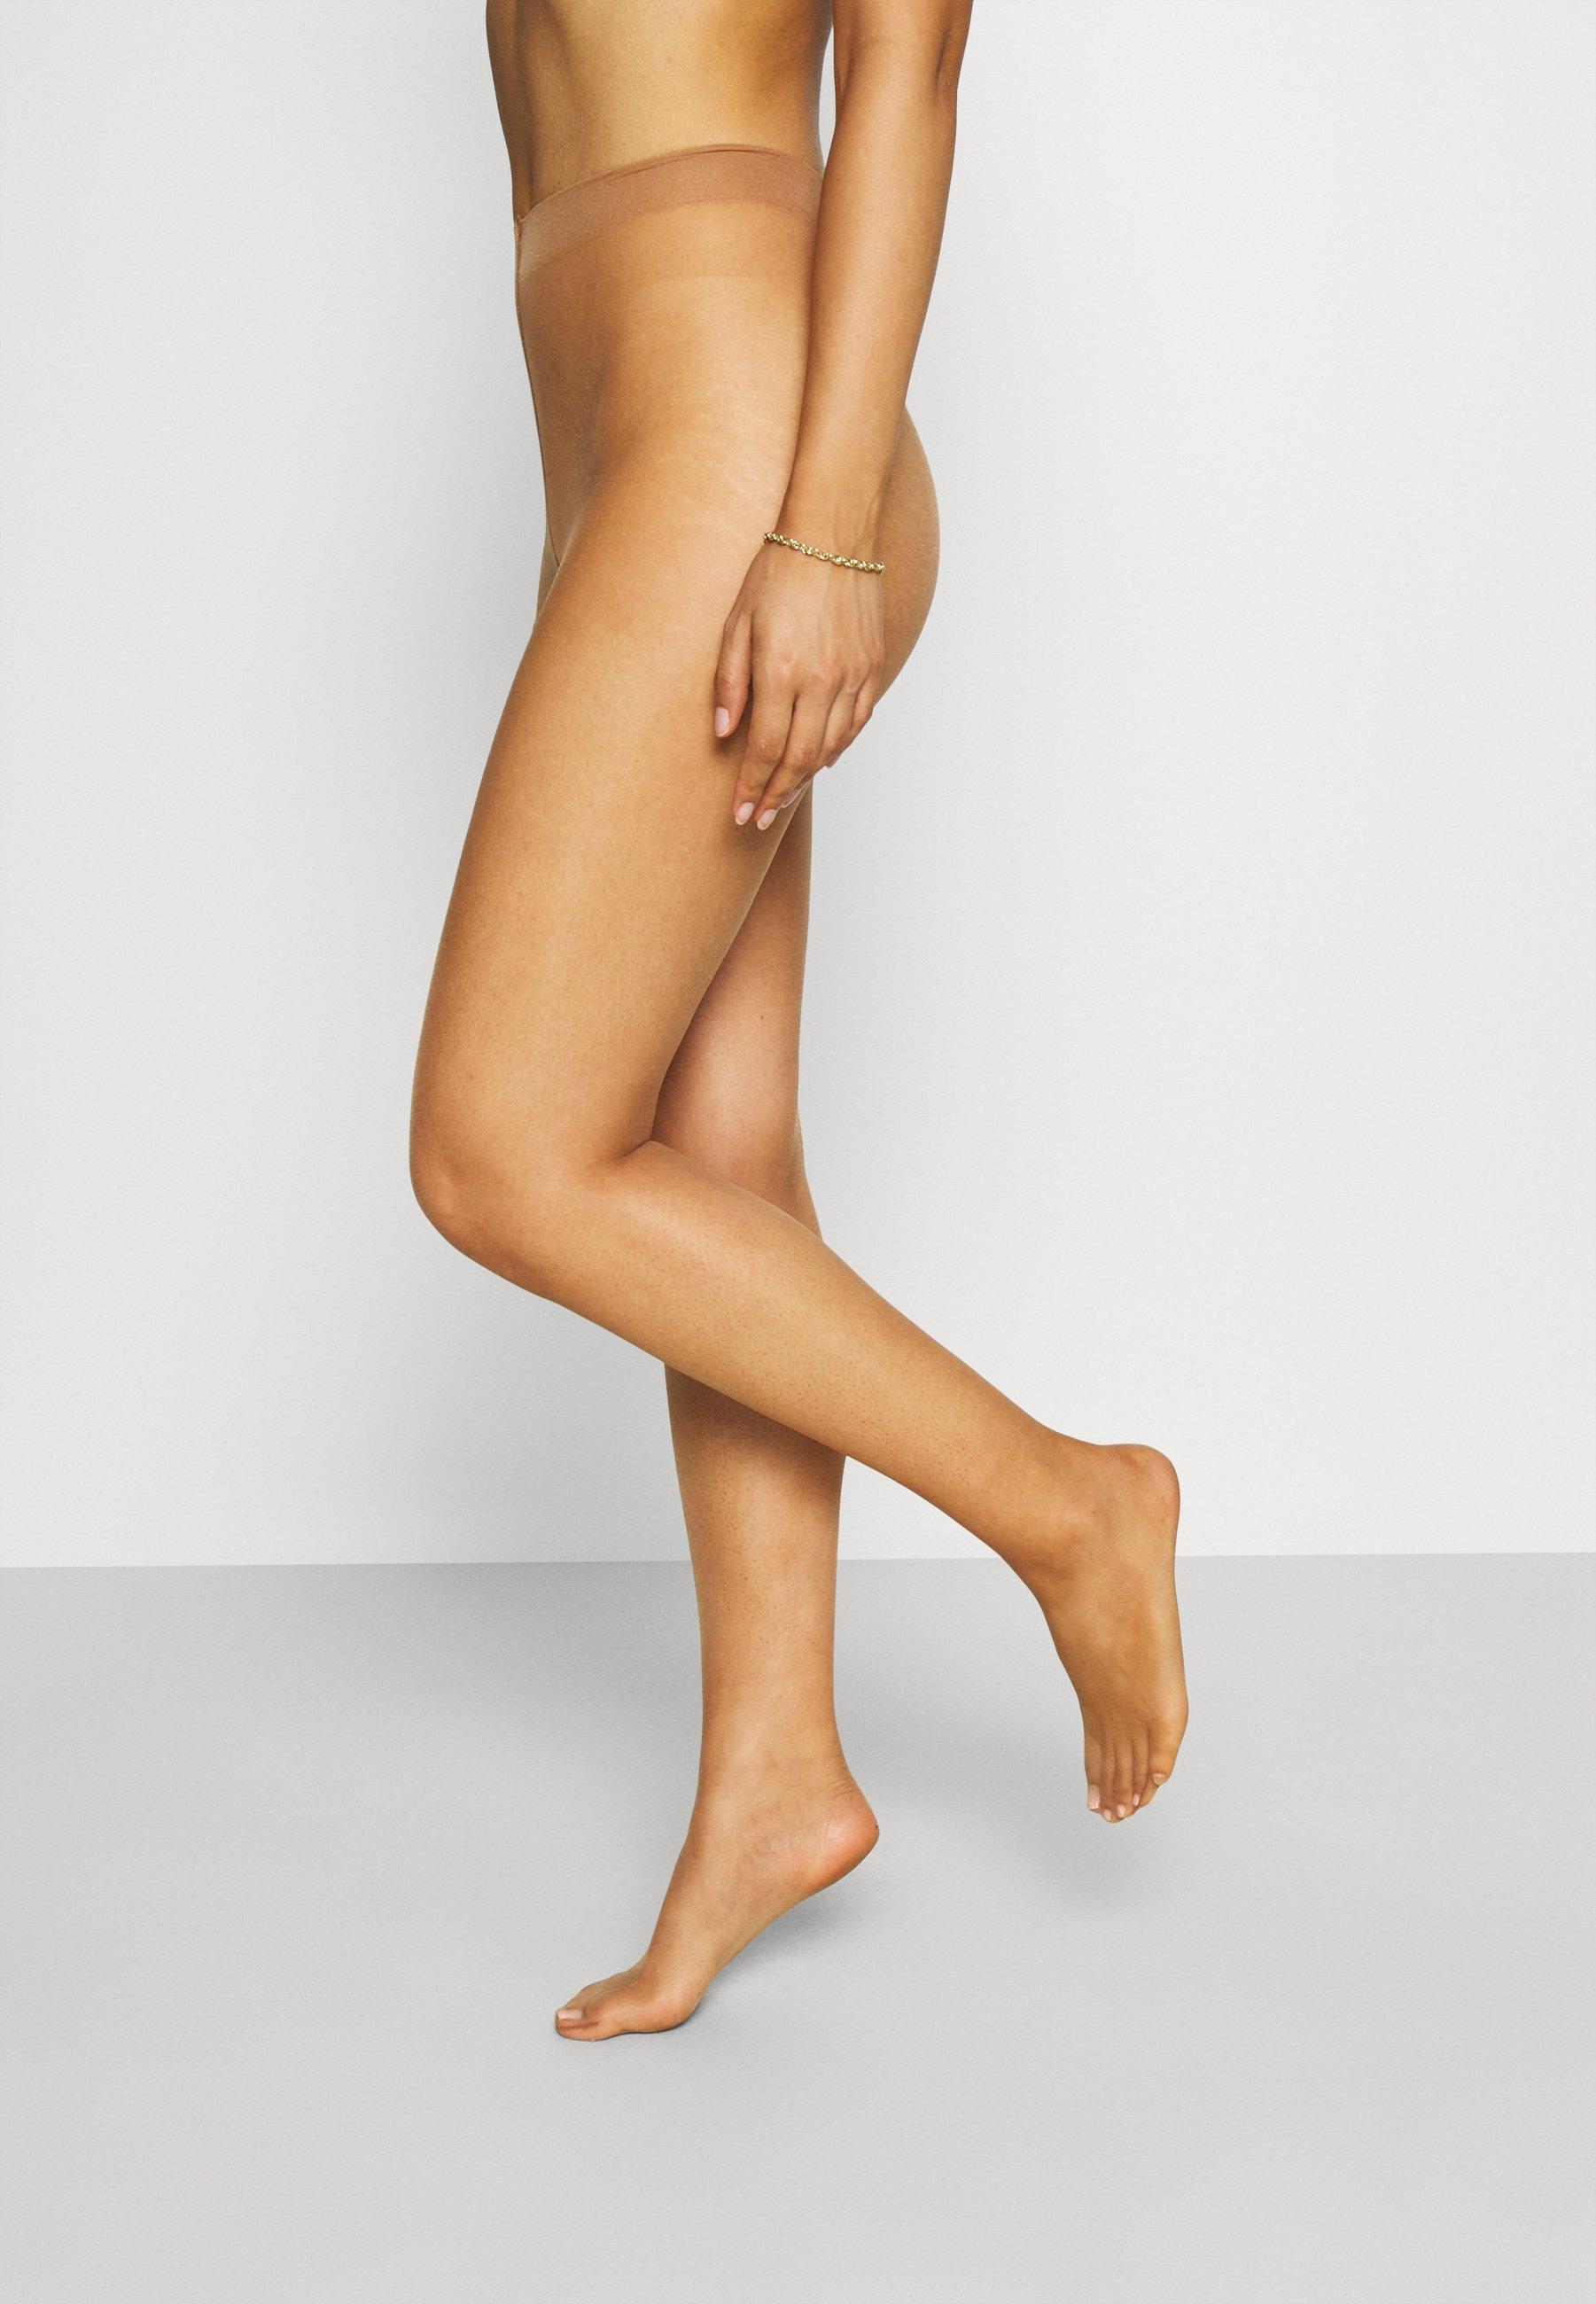 Femme TIGHTS 5 DEN BARE LEG - Collants